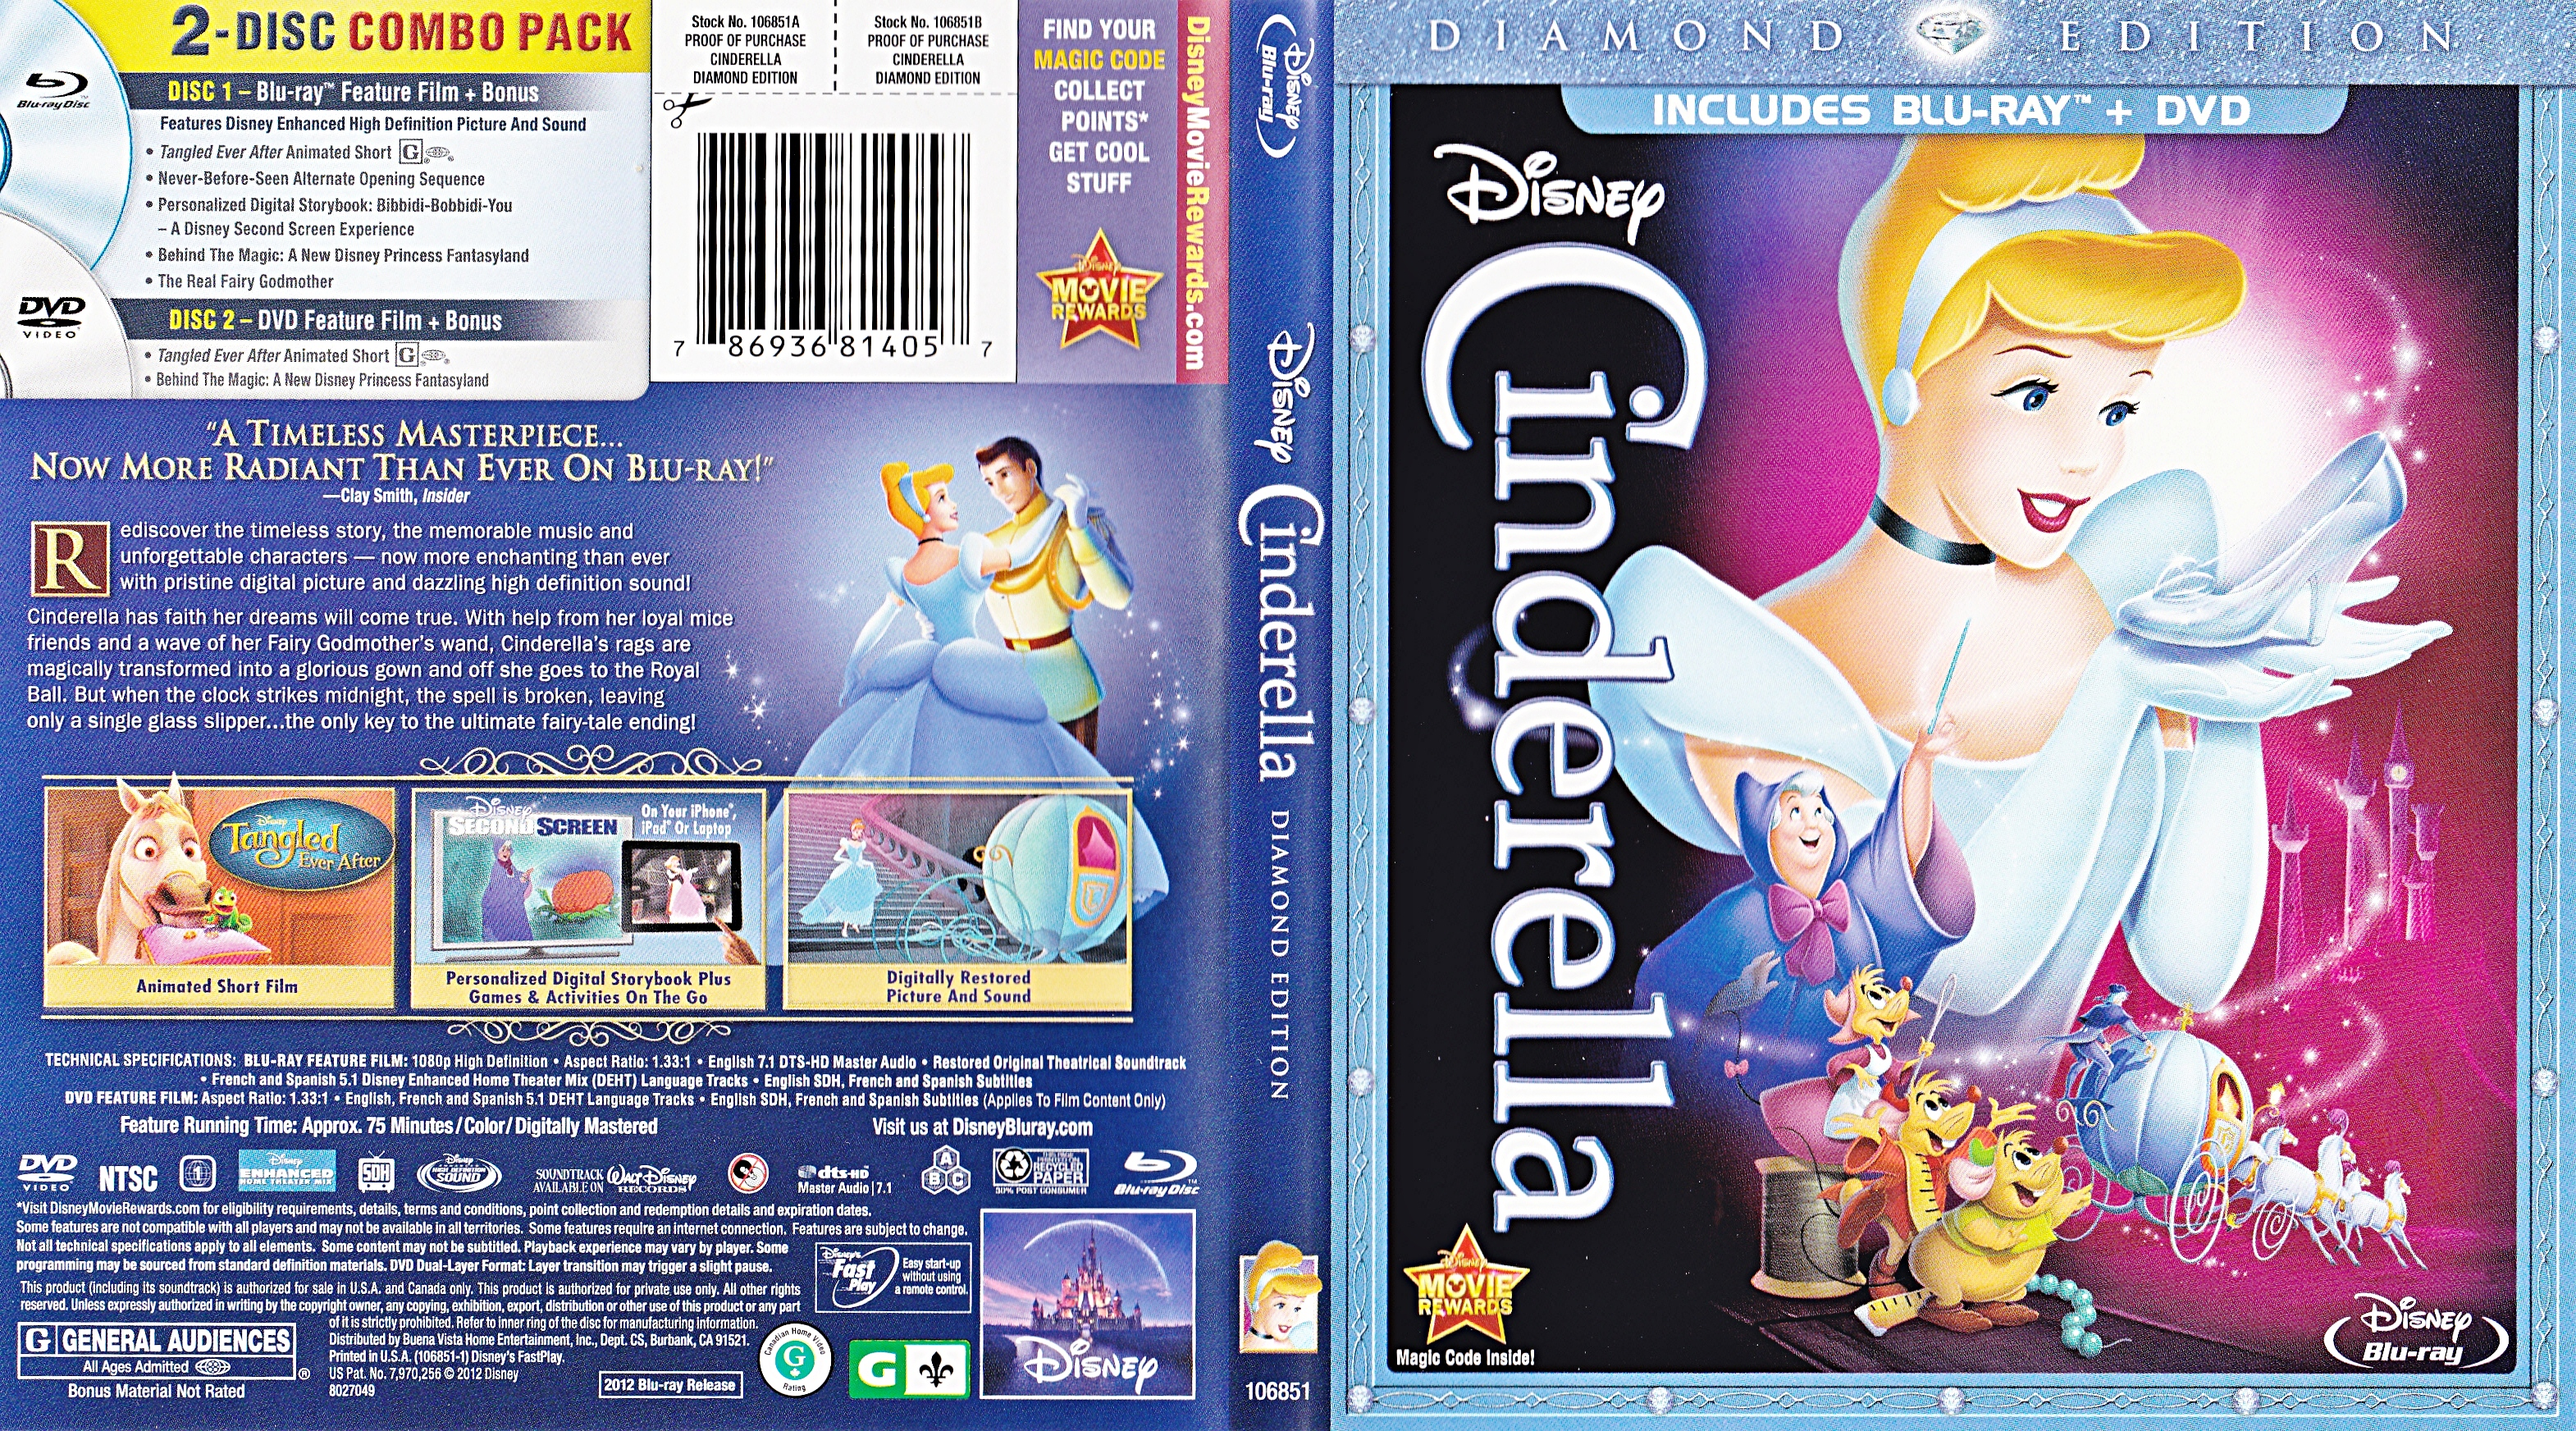 Walt disney Blu-Ray Covers - Cinderella: Diamond Edition